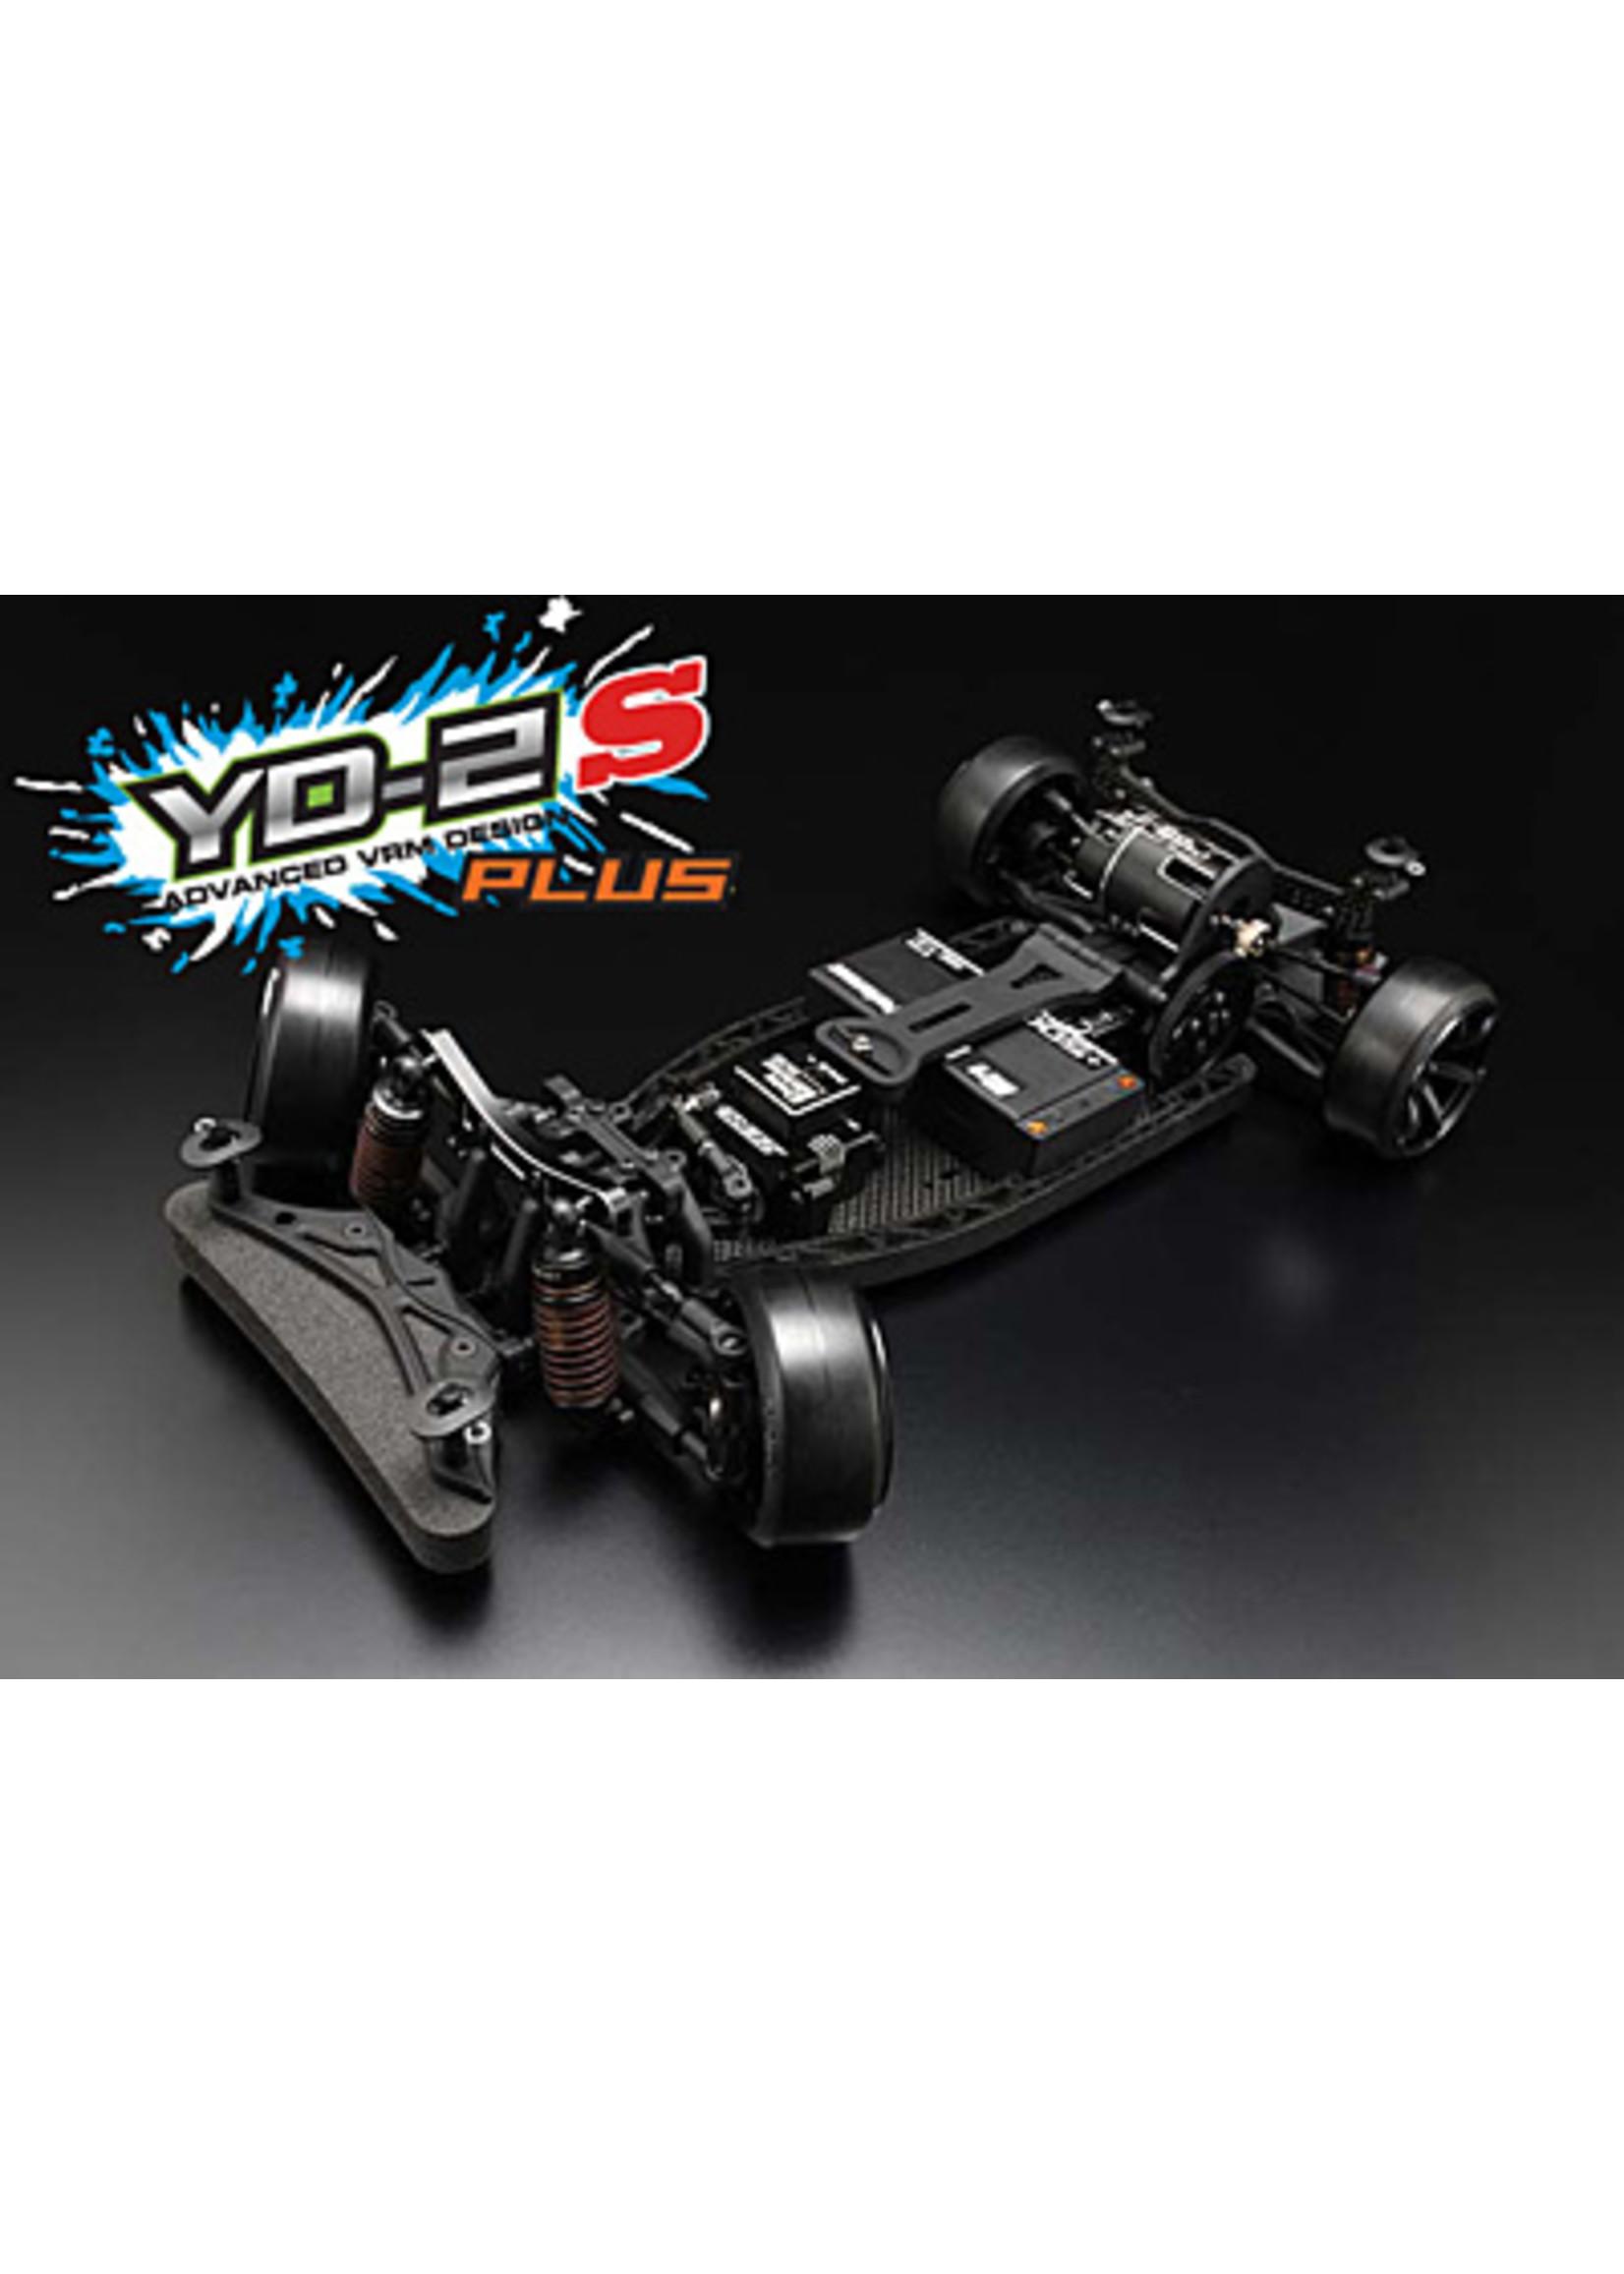 Yokomo Yokomo YD-2S Plus RWD Drift Car Kit (Graphite Chassis)DP-YD2S-PL